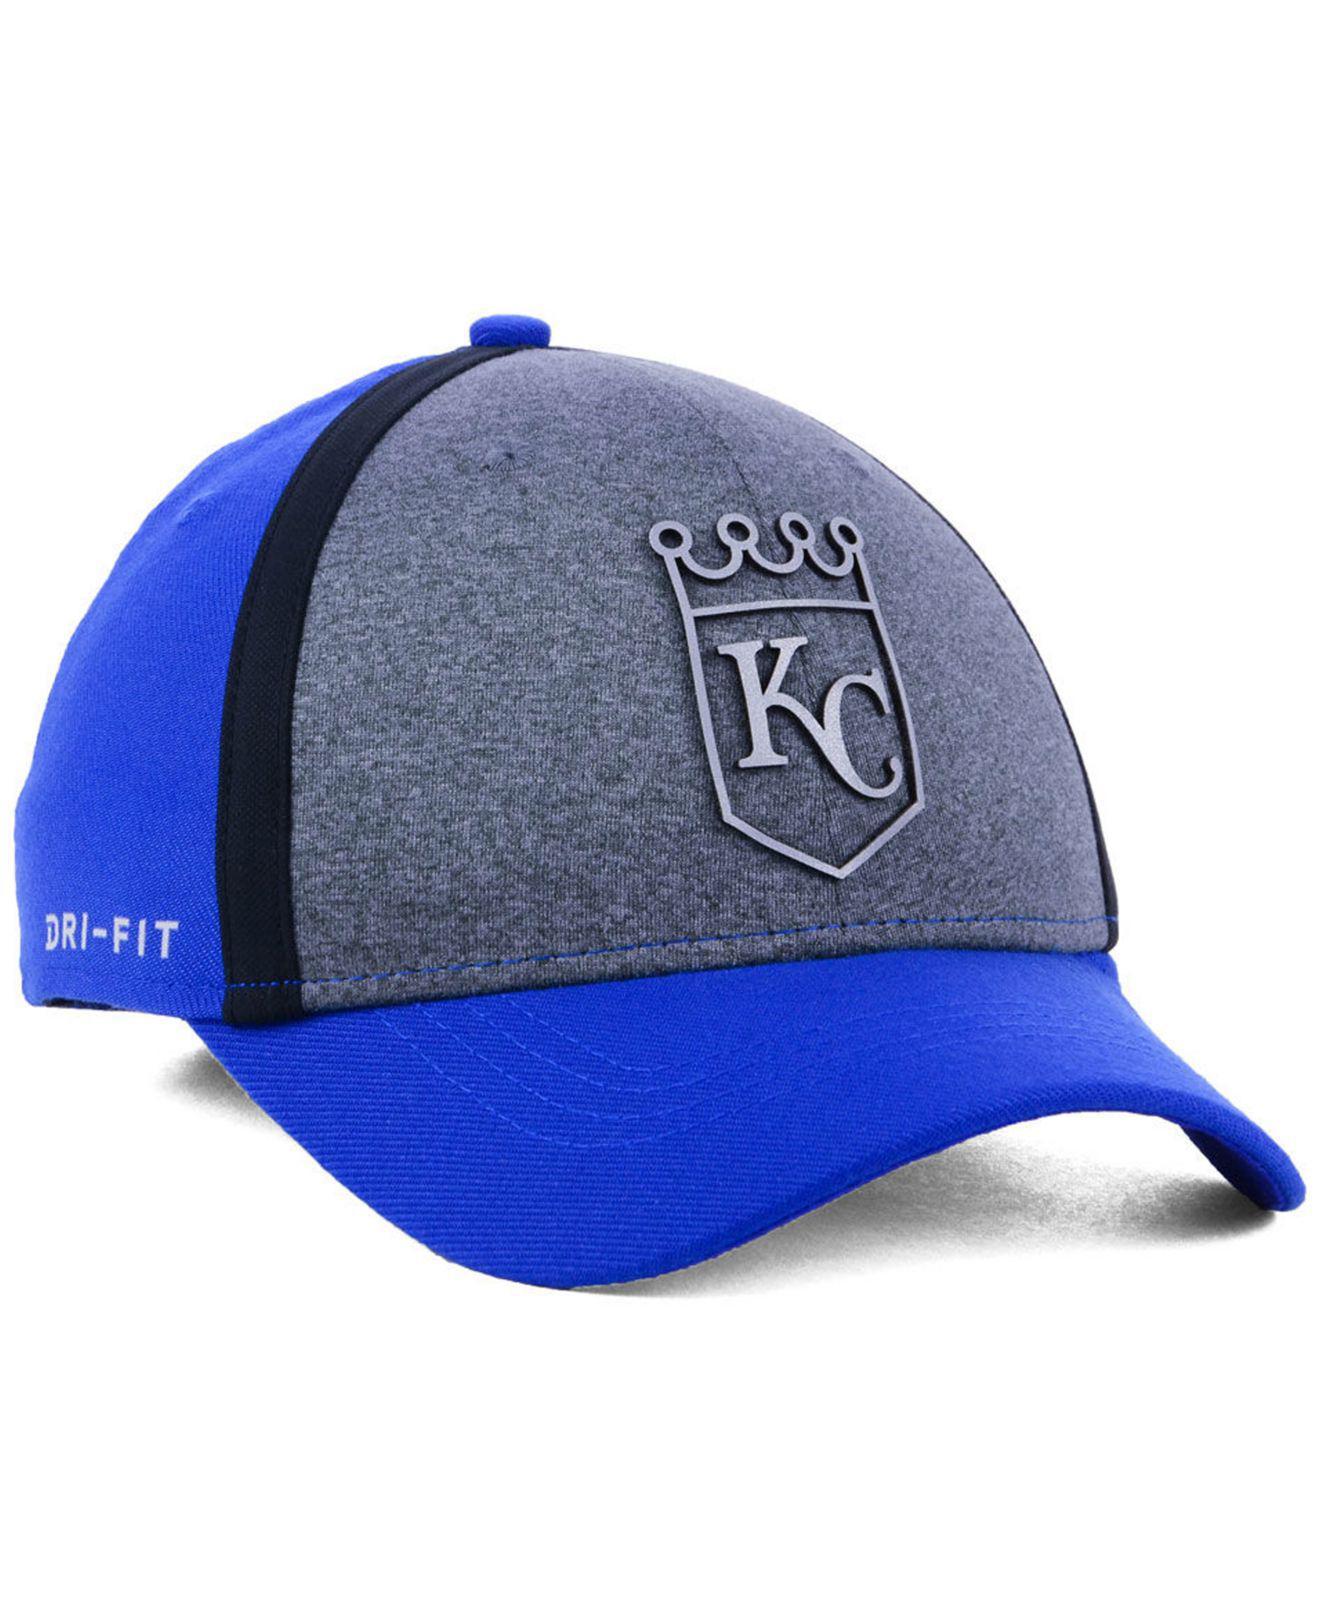 b711f679892 ... new style kansas city royals team color reflective swooshflex cap for men  lyst. view fullscreen